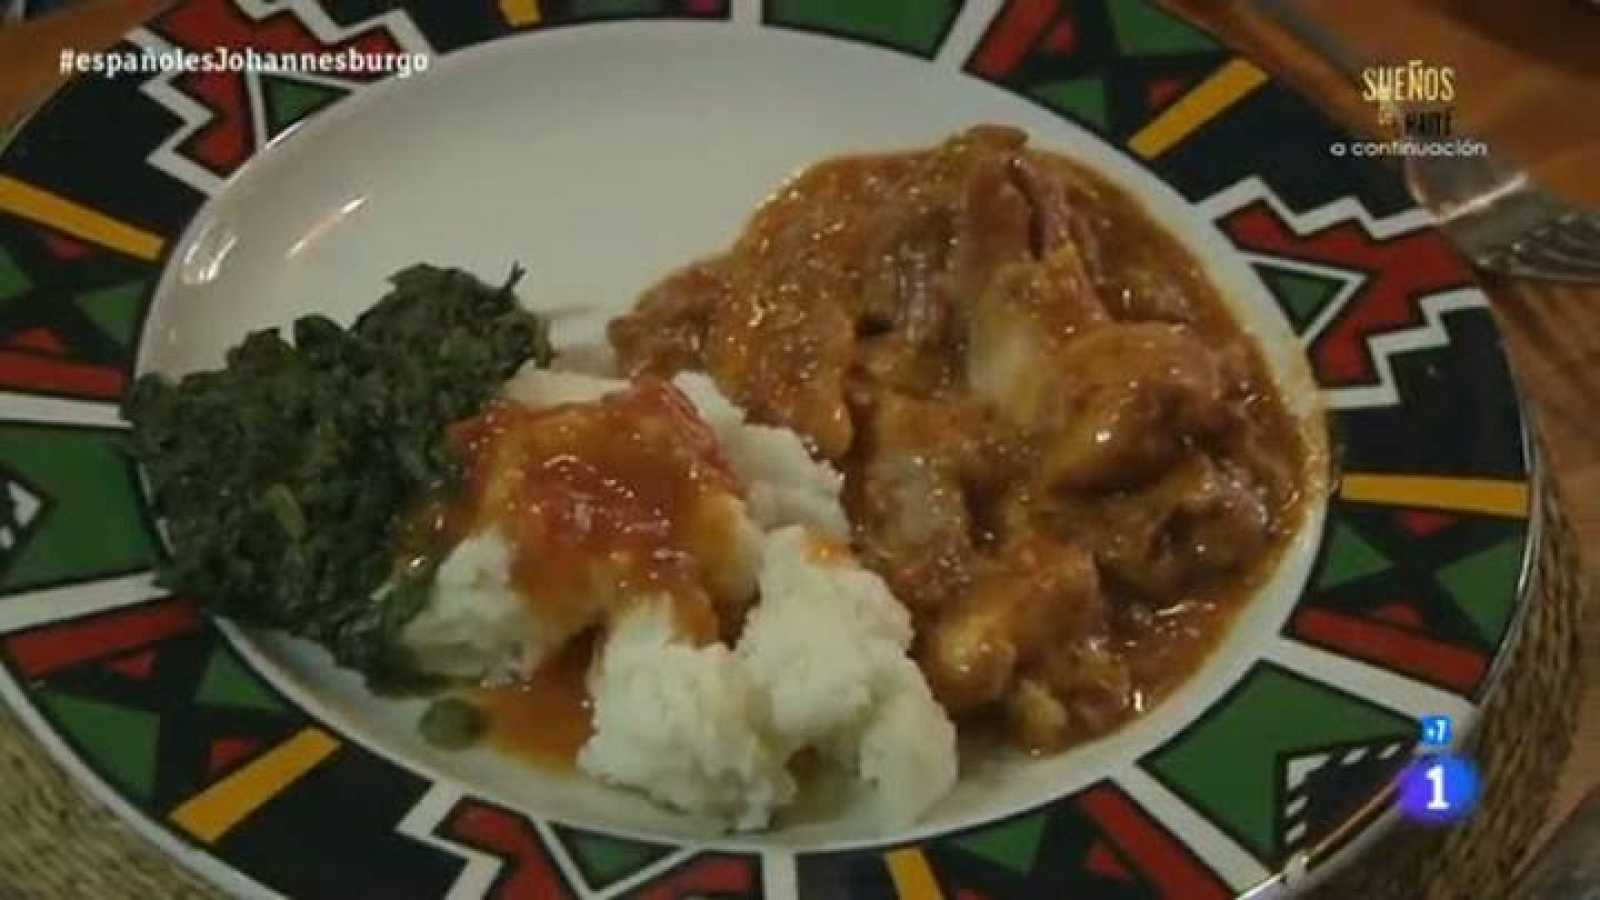 Probamos una receta zulu en Johannesburgo